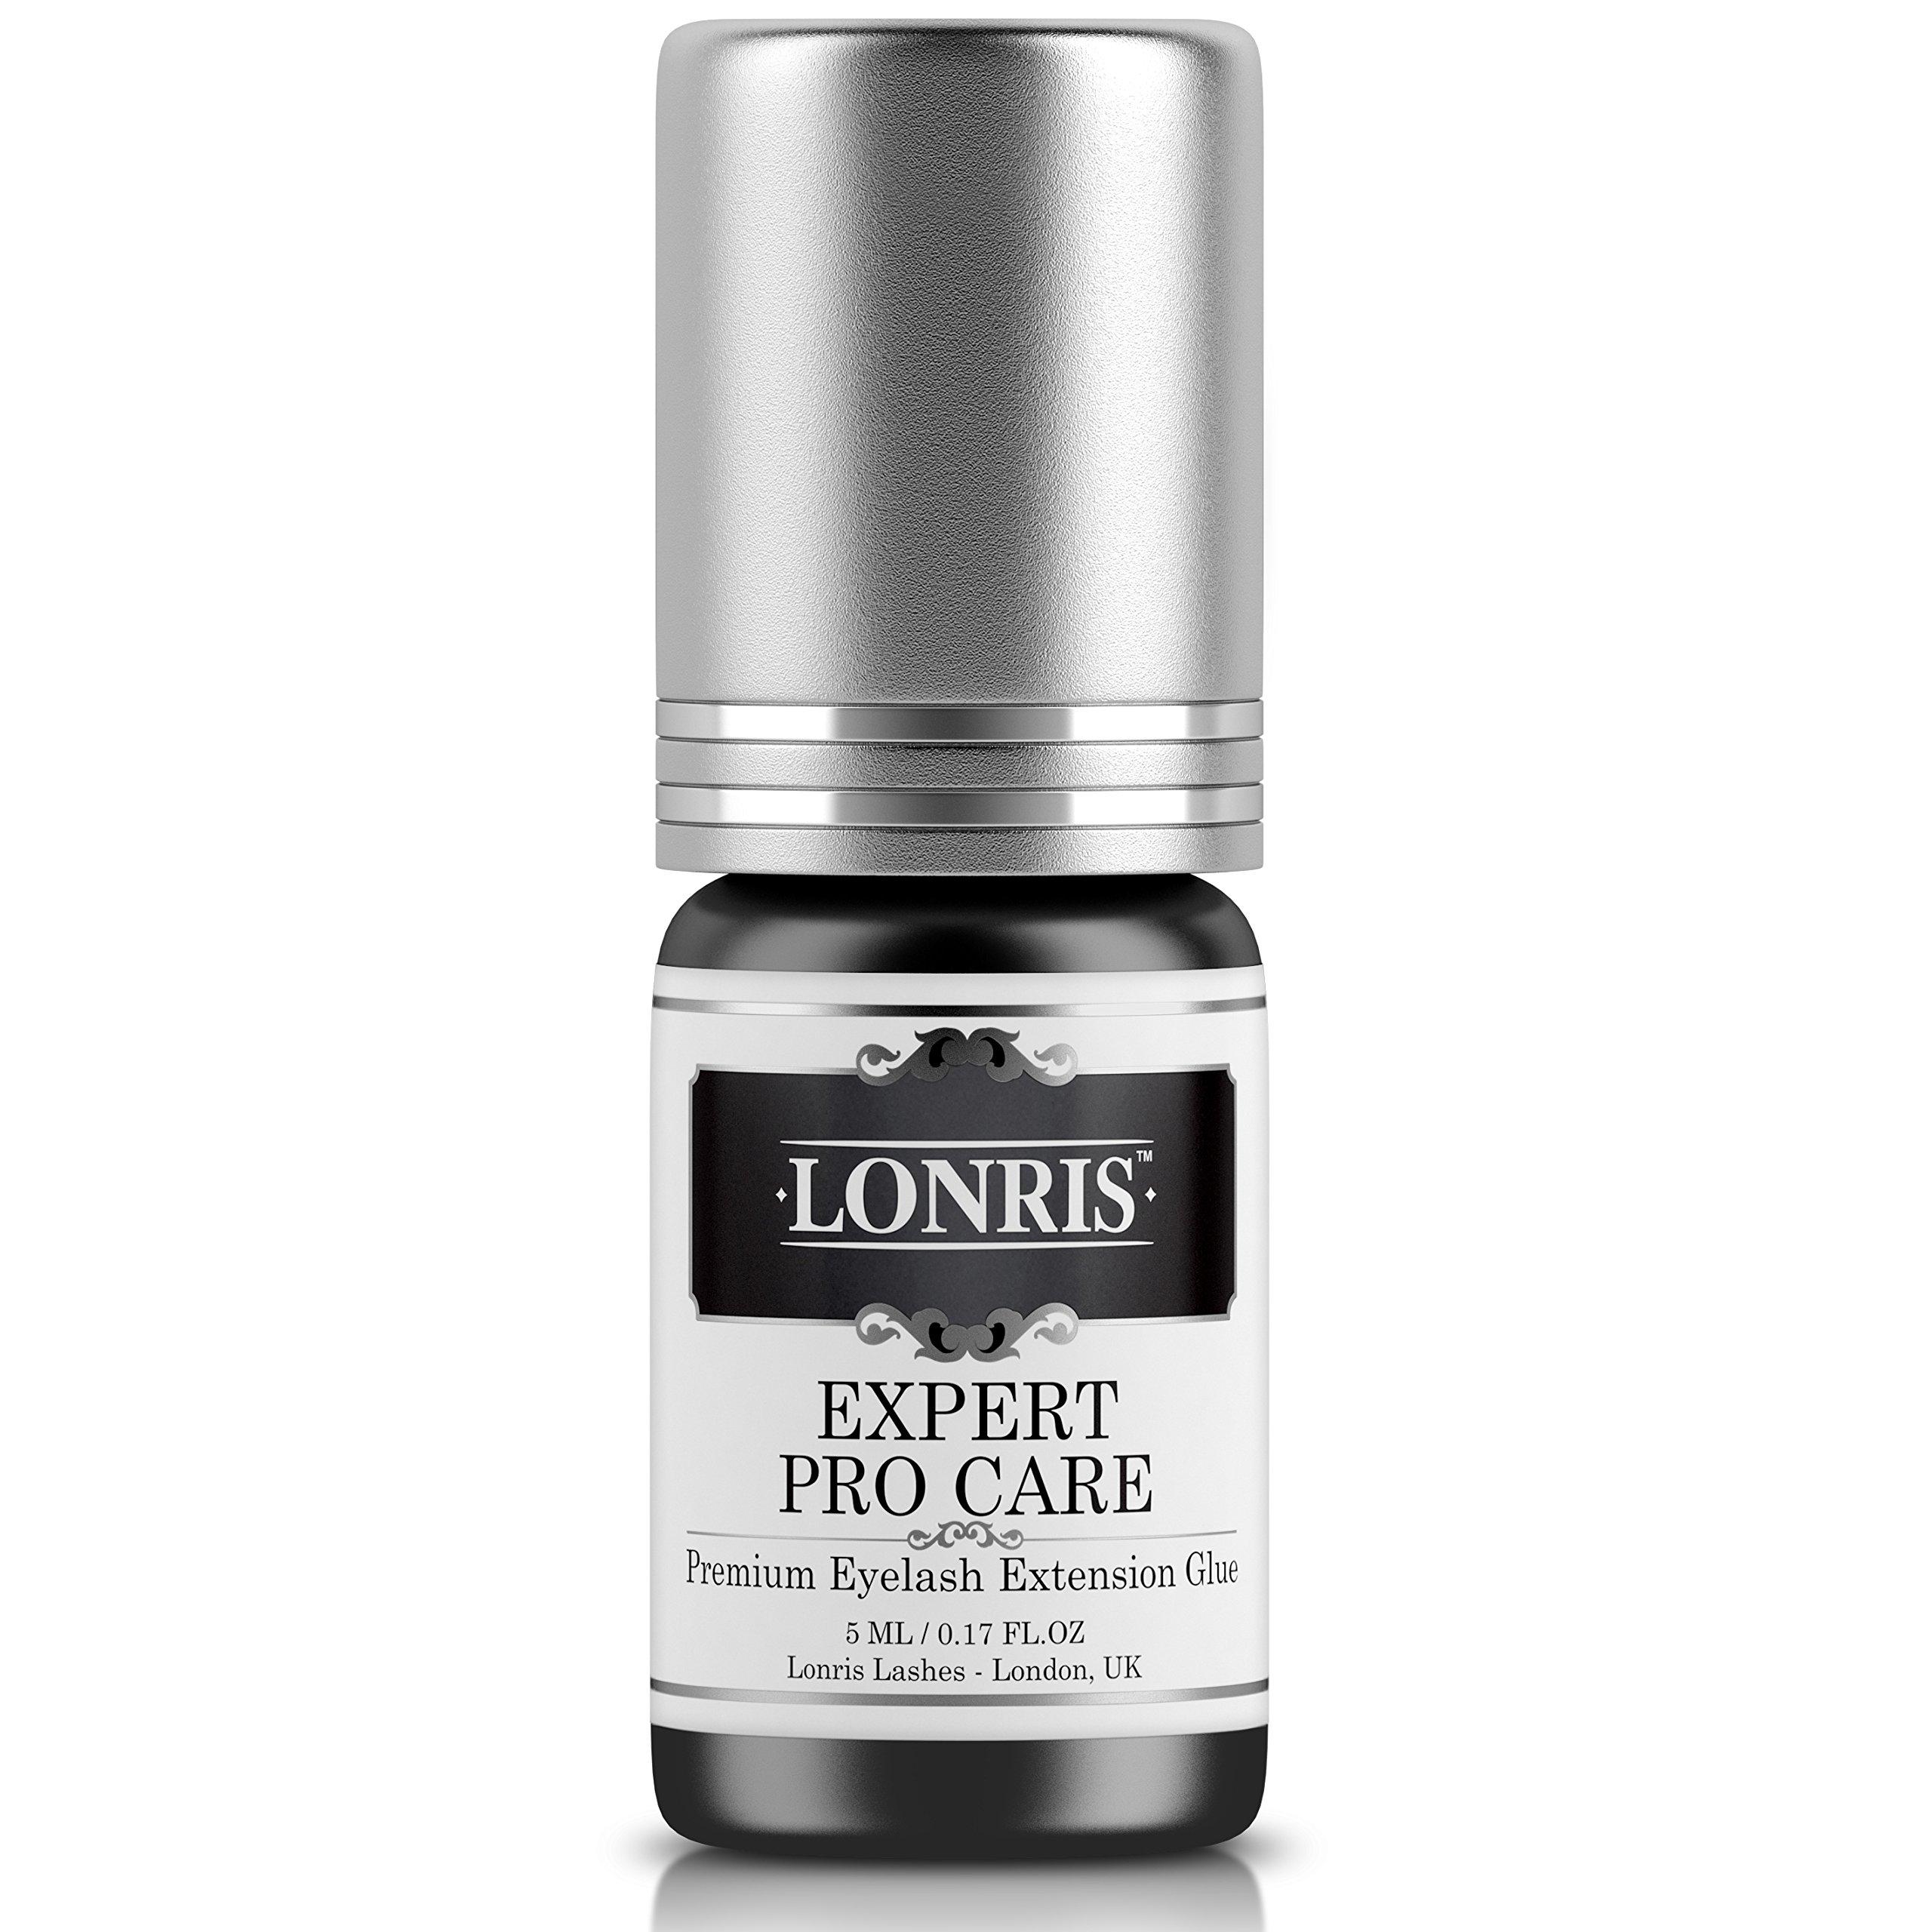 LONRIS Sensitive Low Fume Extension Glue 5 ml/Professional Advanced Individual Semi-Permanent Lash Adhesive Bond Supplies / 2-4 Seconds Dry Time & 5-6 Weeks Bonding - Long Retention/Black